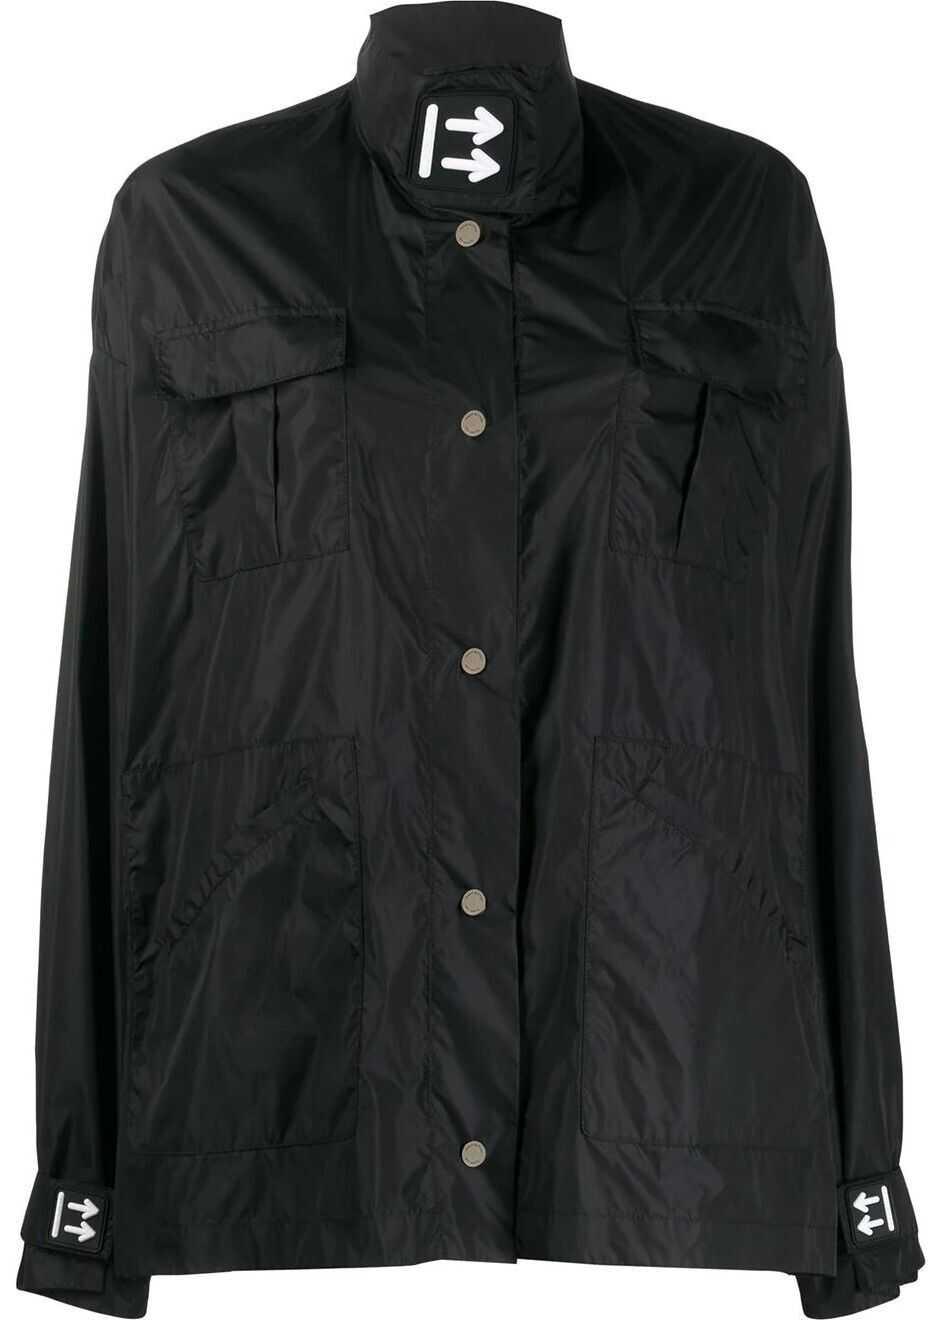 Off-White Polyamide Outerwear Jacket BLACK